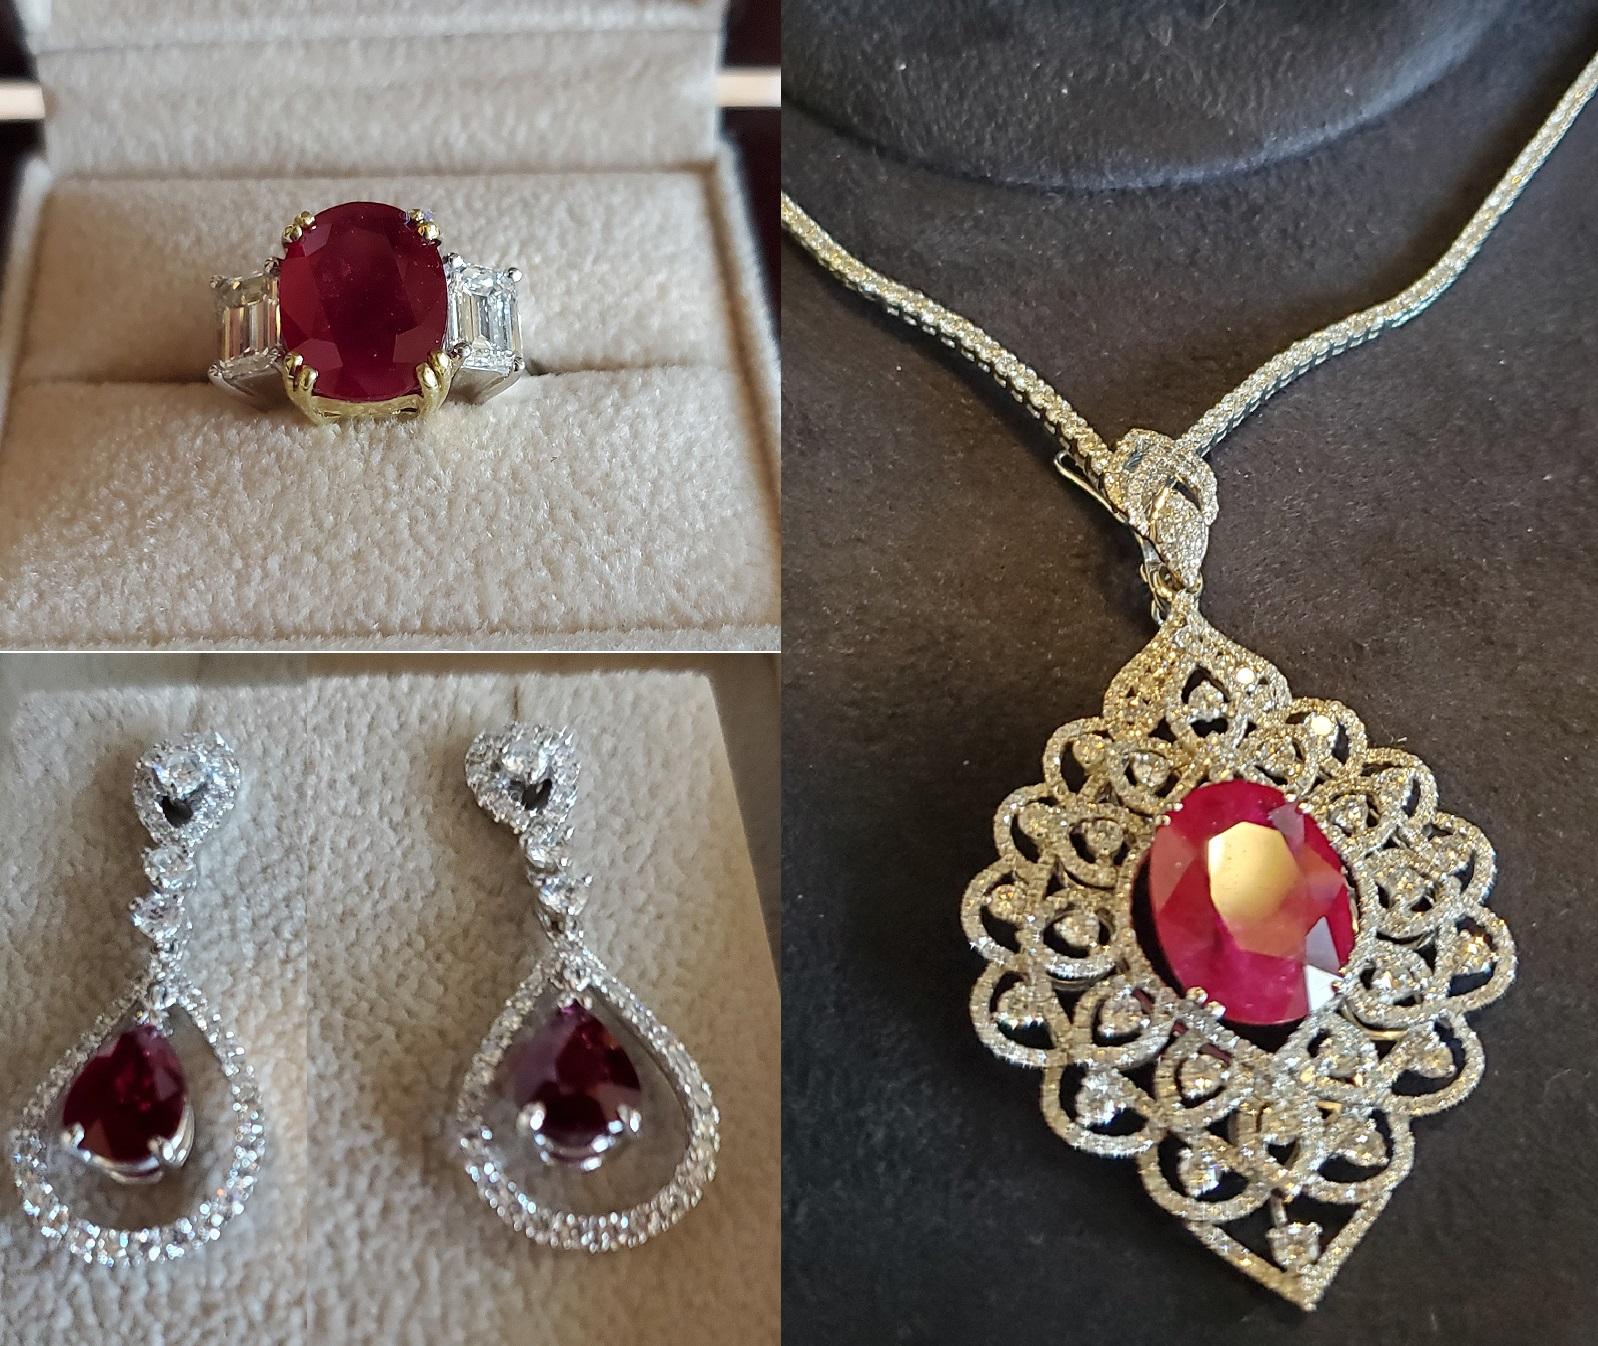 Mixed Ruby & Diamond Ring, Pendant & Earring Set